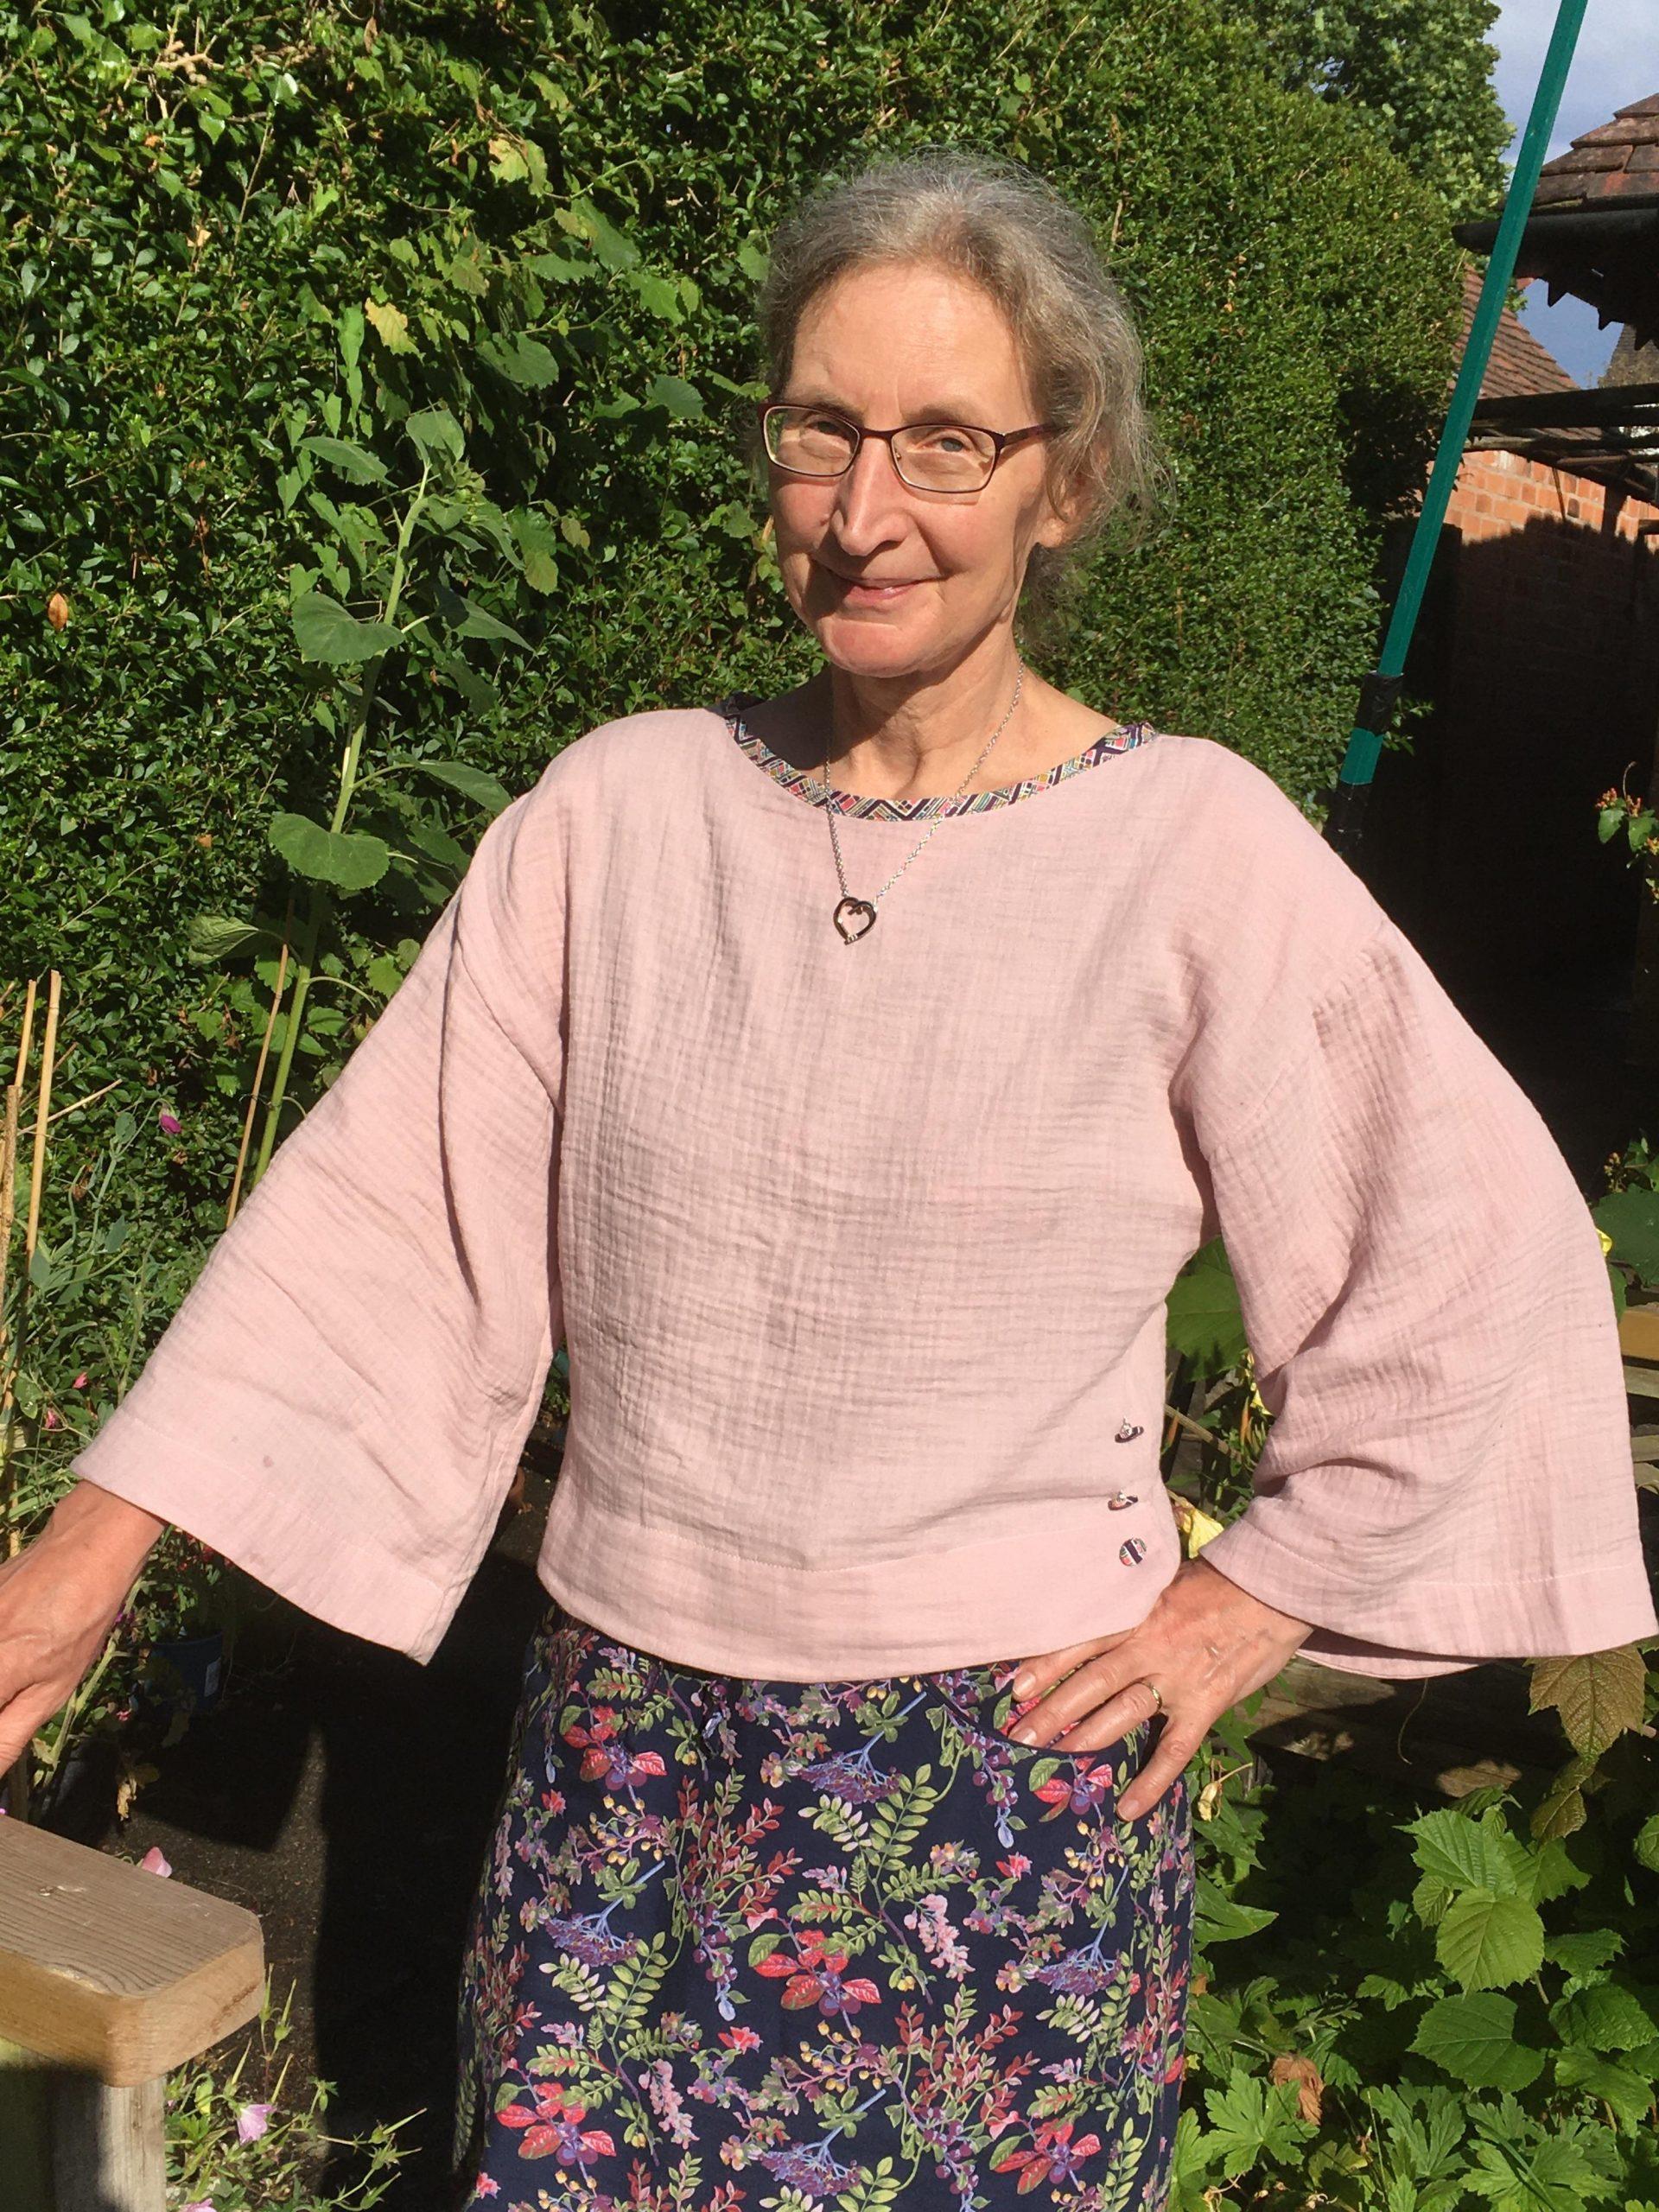 Eliza-sew-little's Nexus blouse